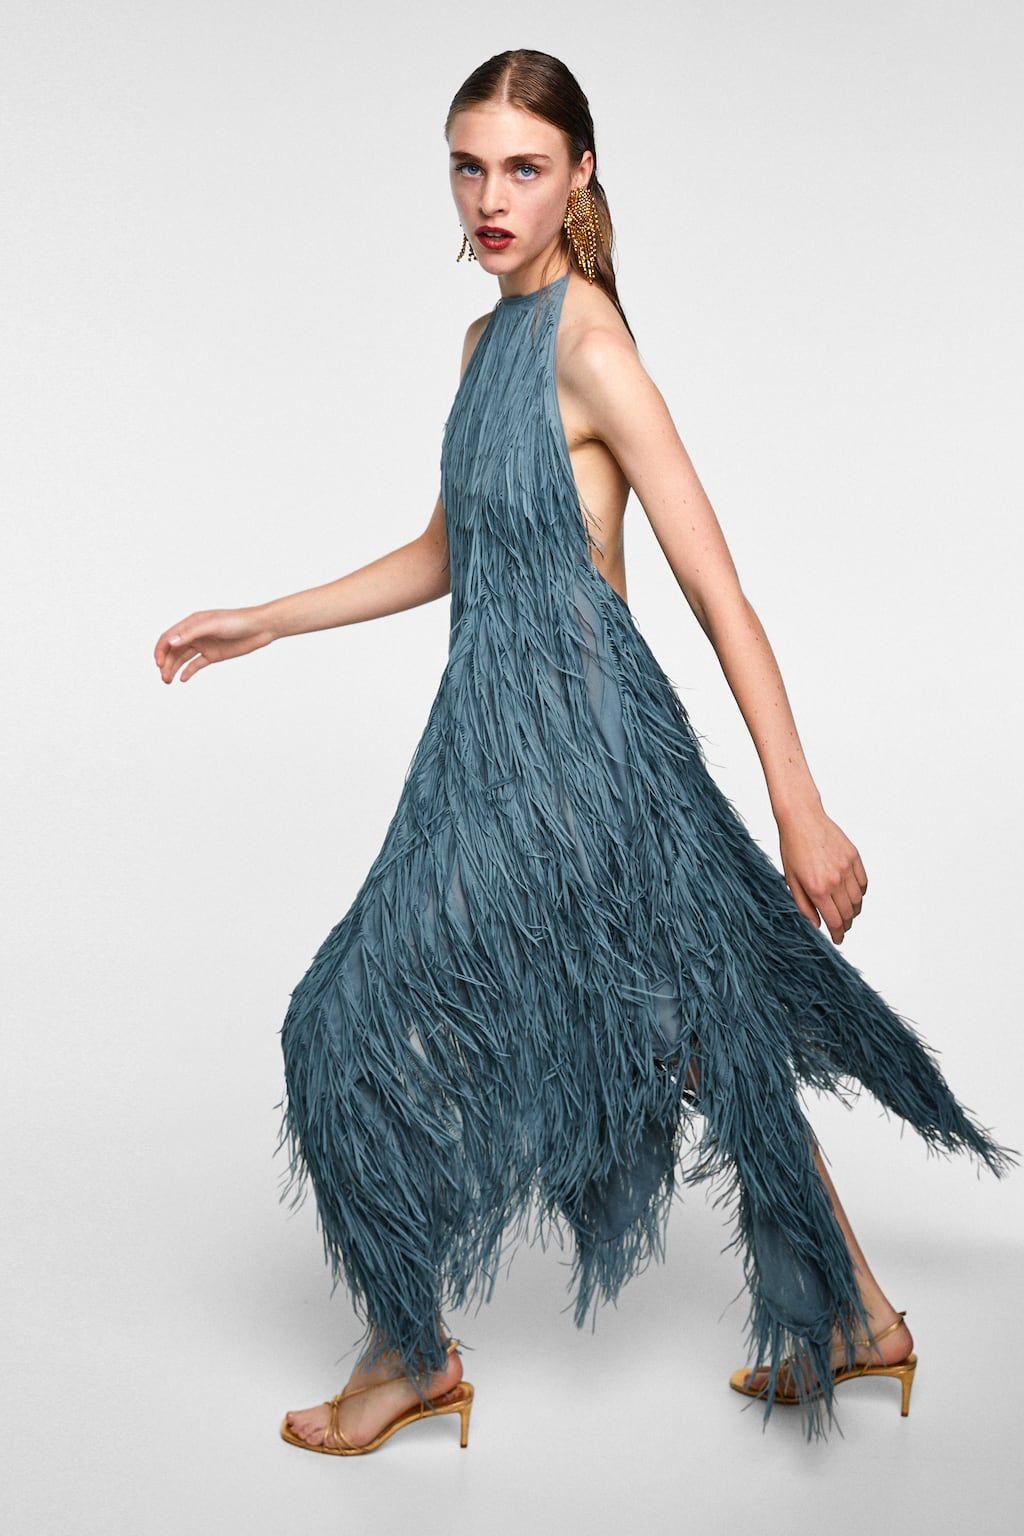 9a460d7f Imagen 6 de VESTIDO HALTER FLECOS de Zara | Zara Inspo in 2019 ...